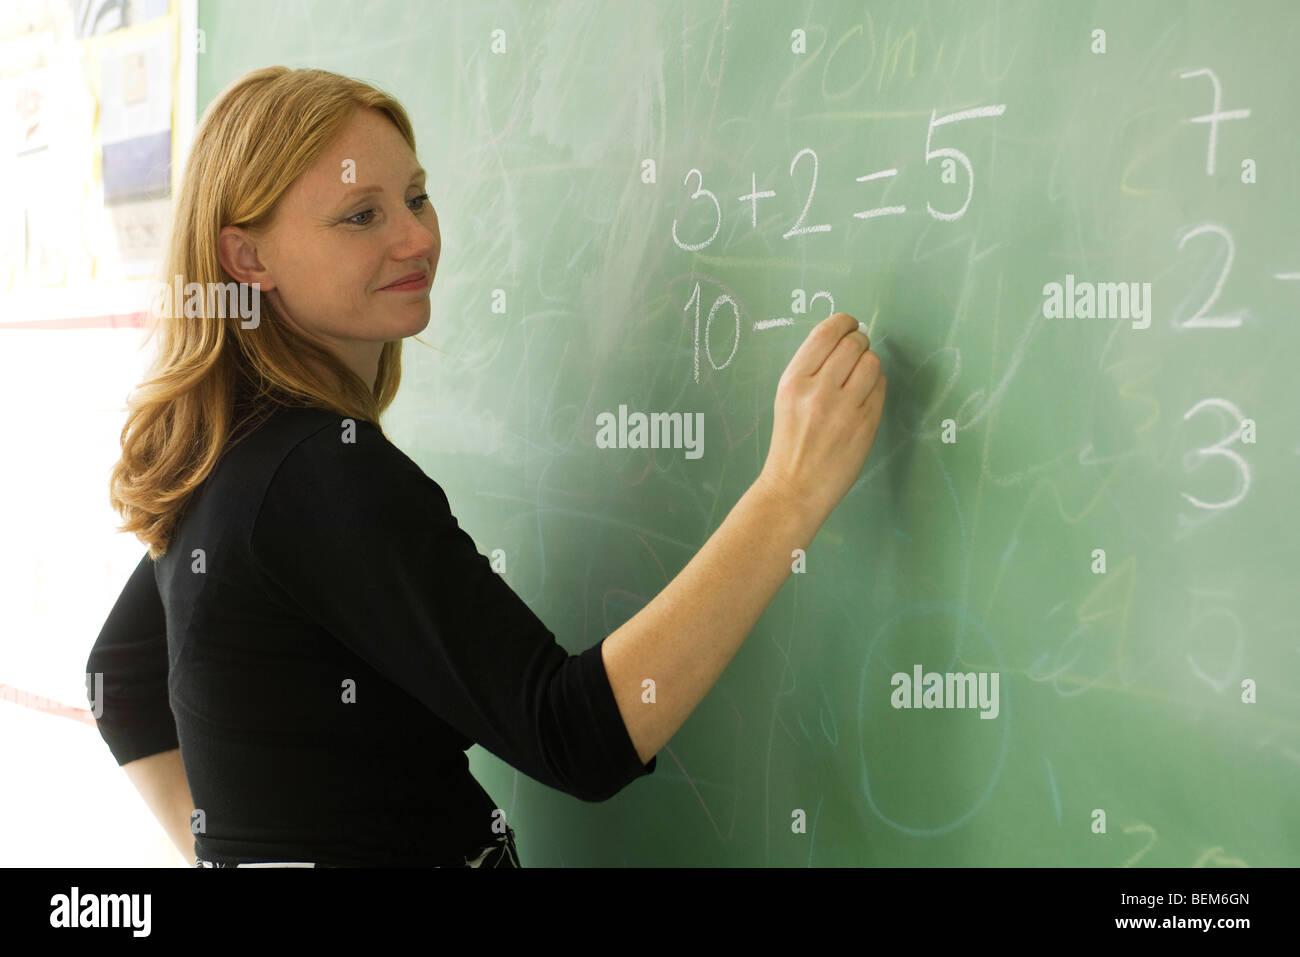 Elementary teacher writing math equations on blackboard - Stock Image